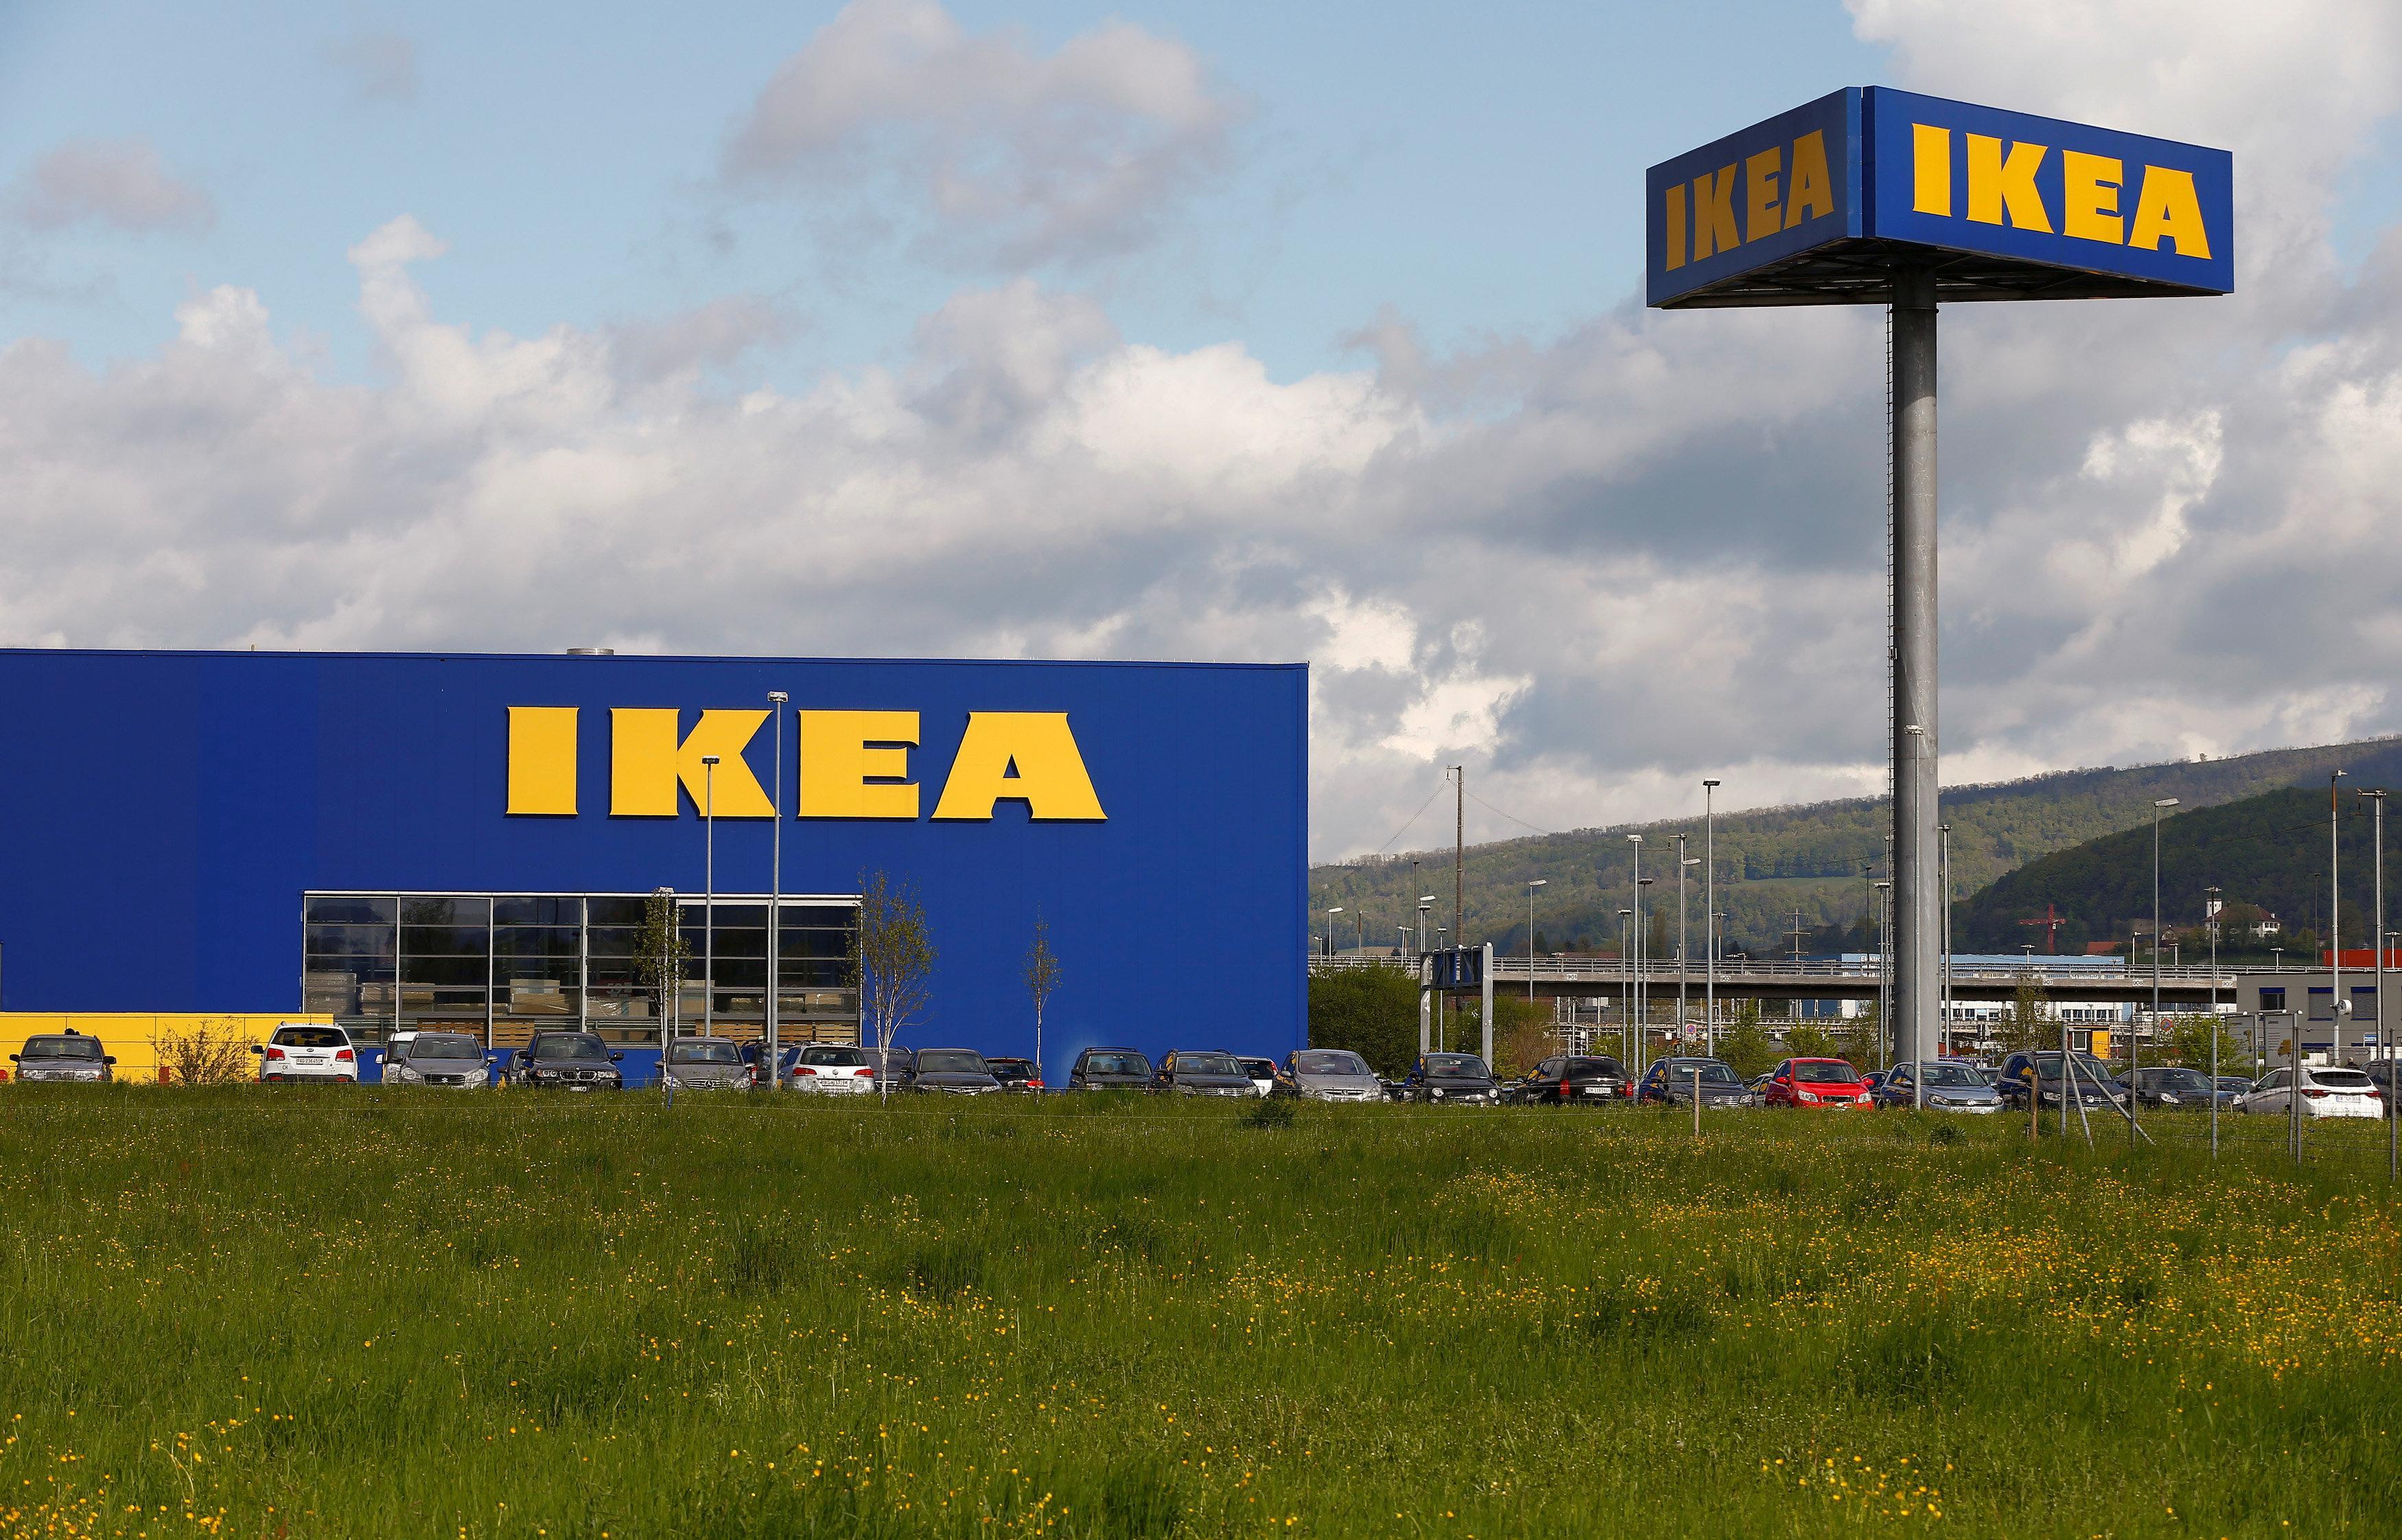 Swedish Ikea Founder Kamprad Dies At 91 Reuters